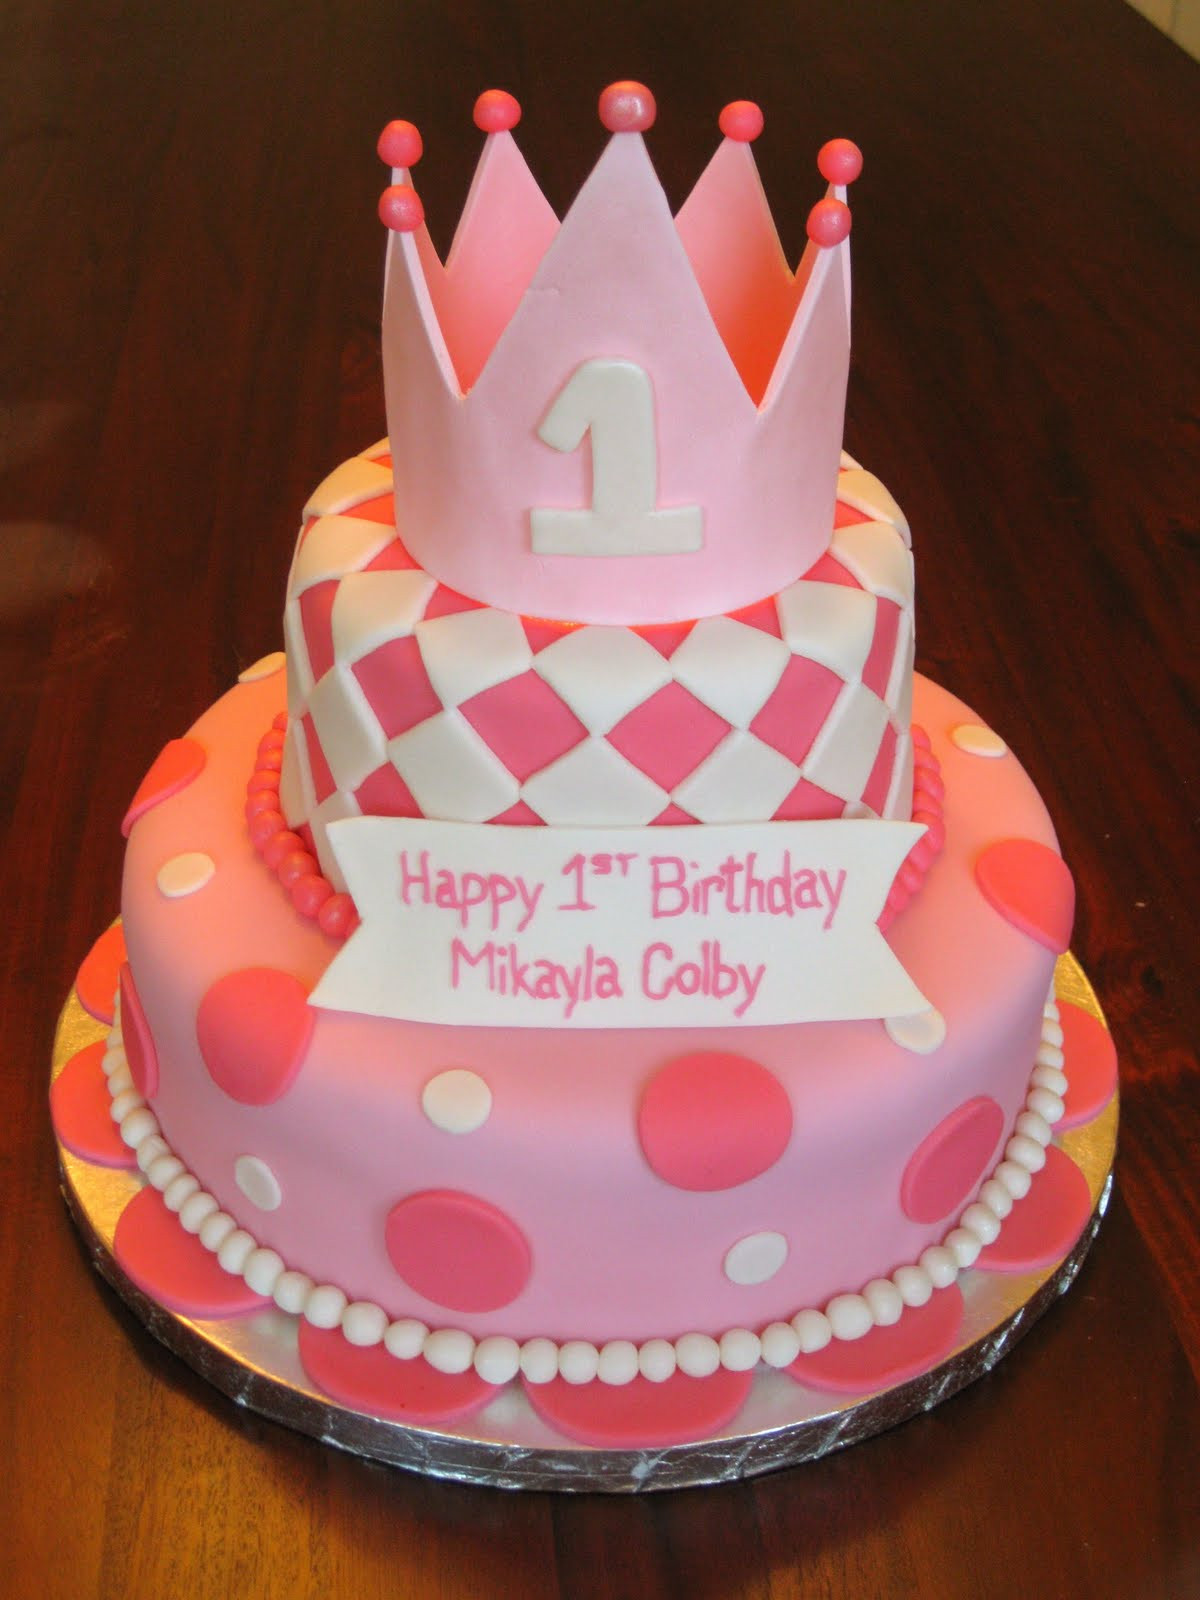 Fondant Birthday Cakes  Fun Fondant Cakes I love looking at colorful cakes